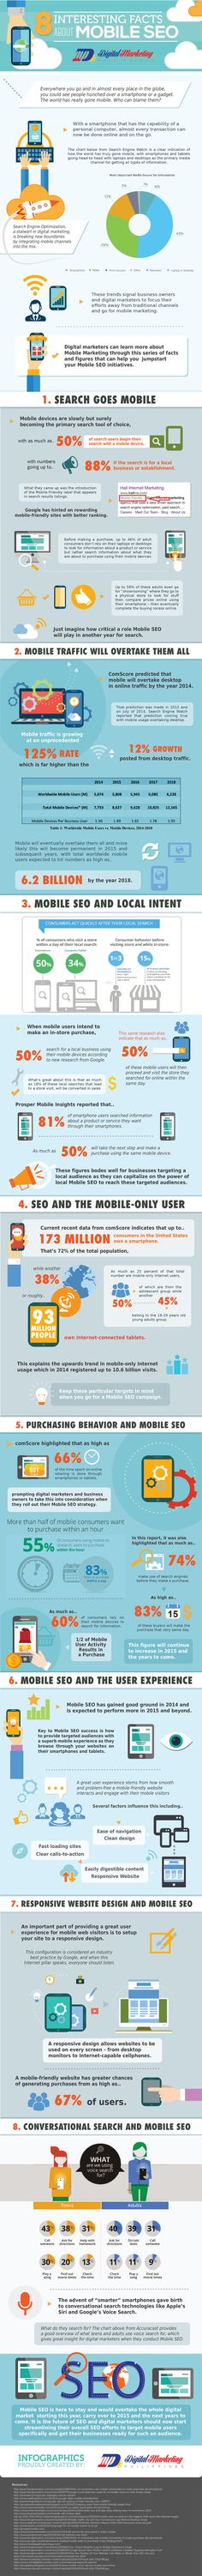 Der SEO-Kritiker: Welche Rolle spielt mobiles SEO? [Infografik]